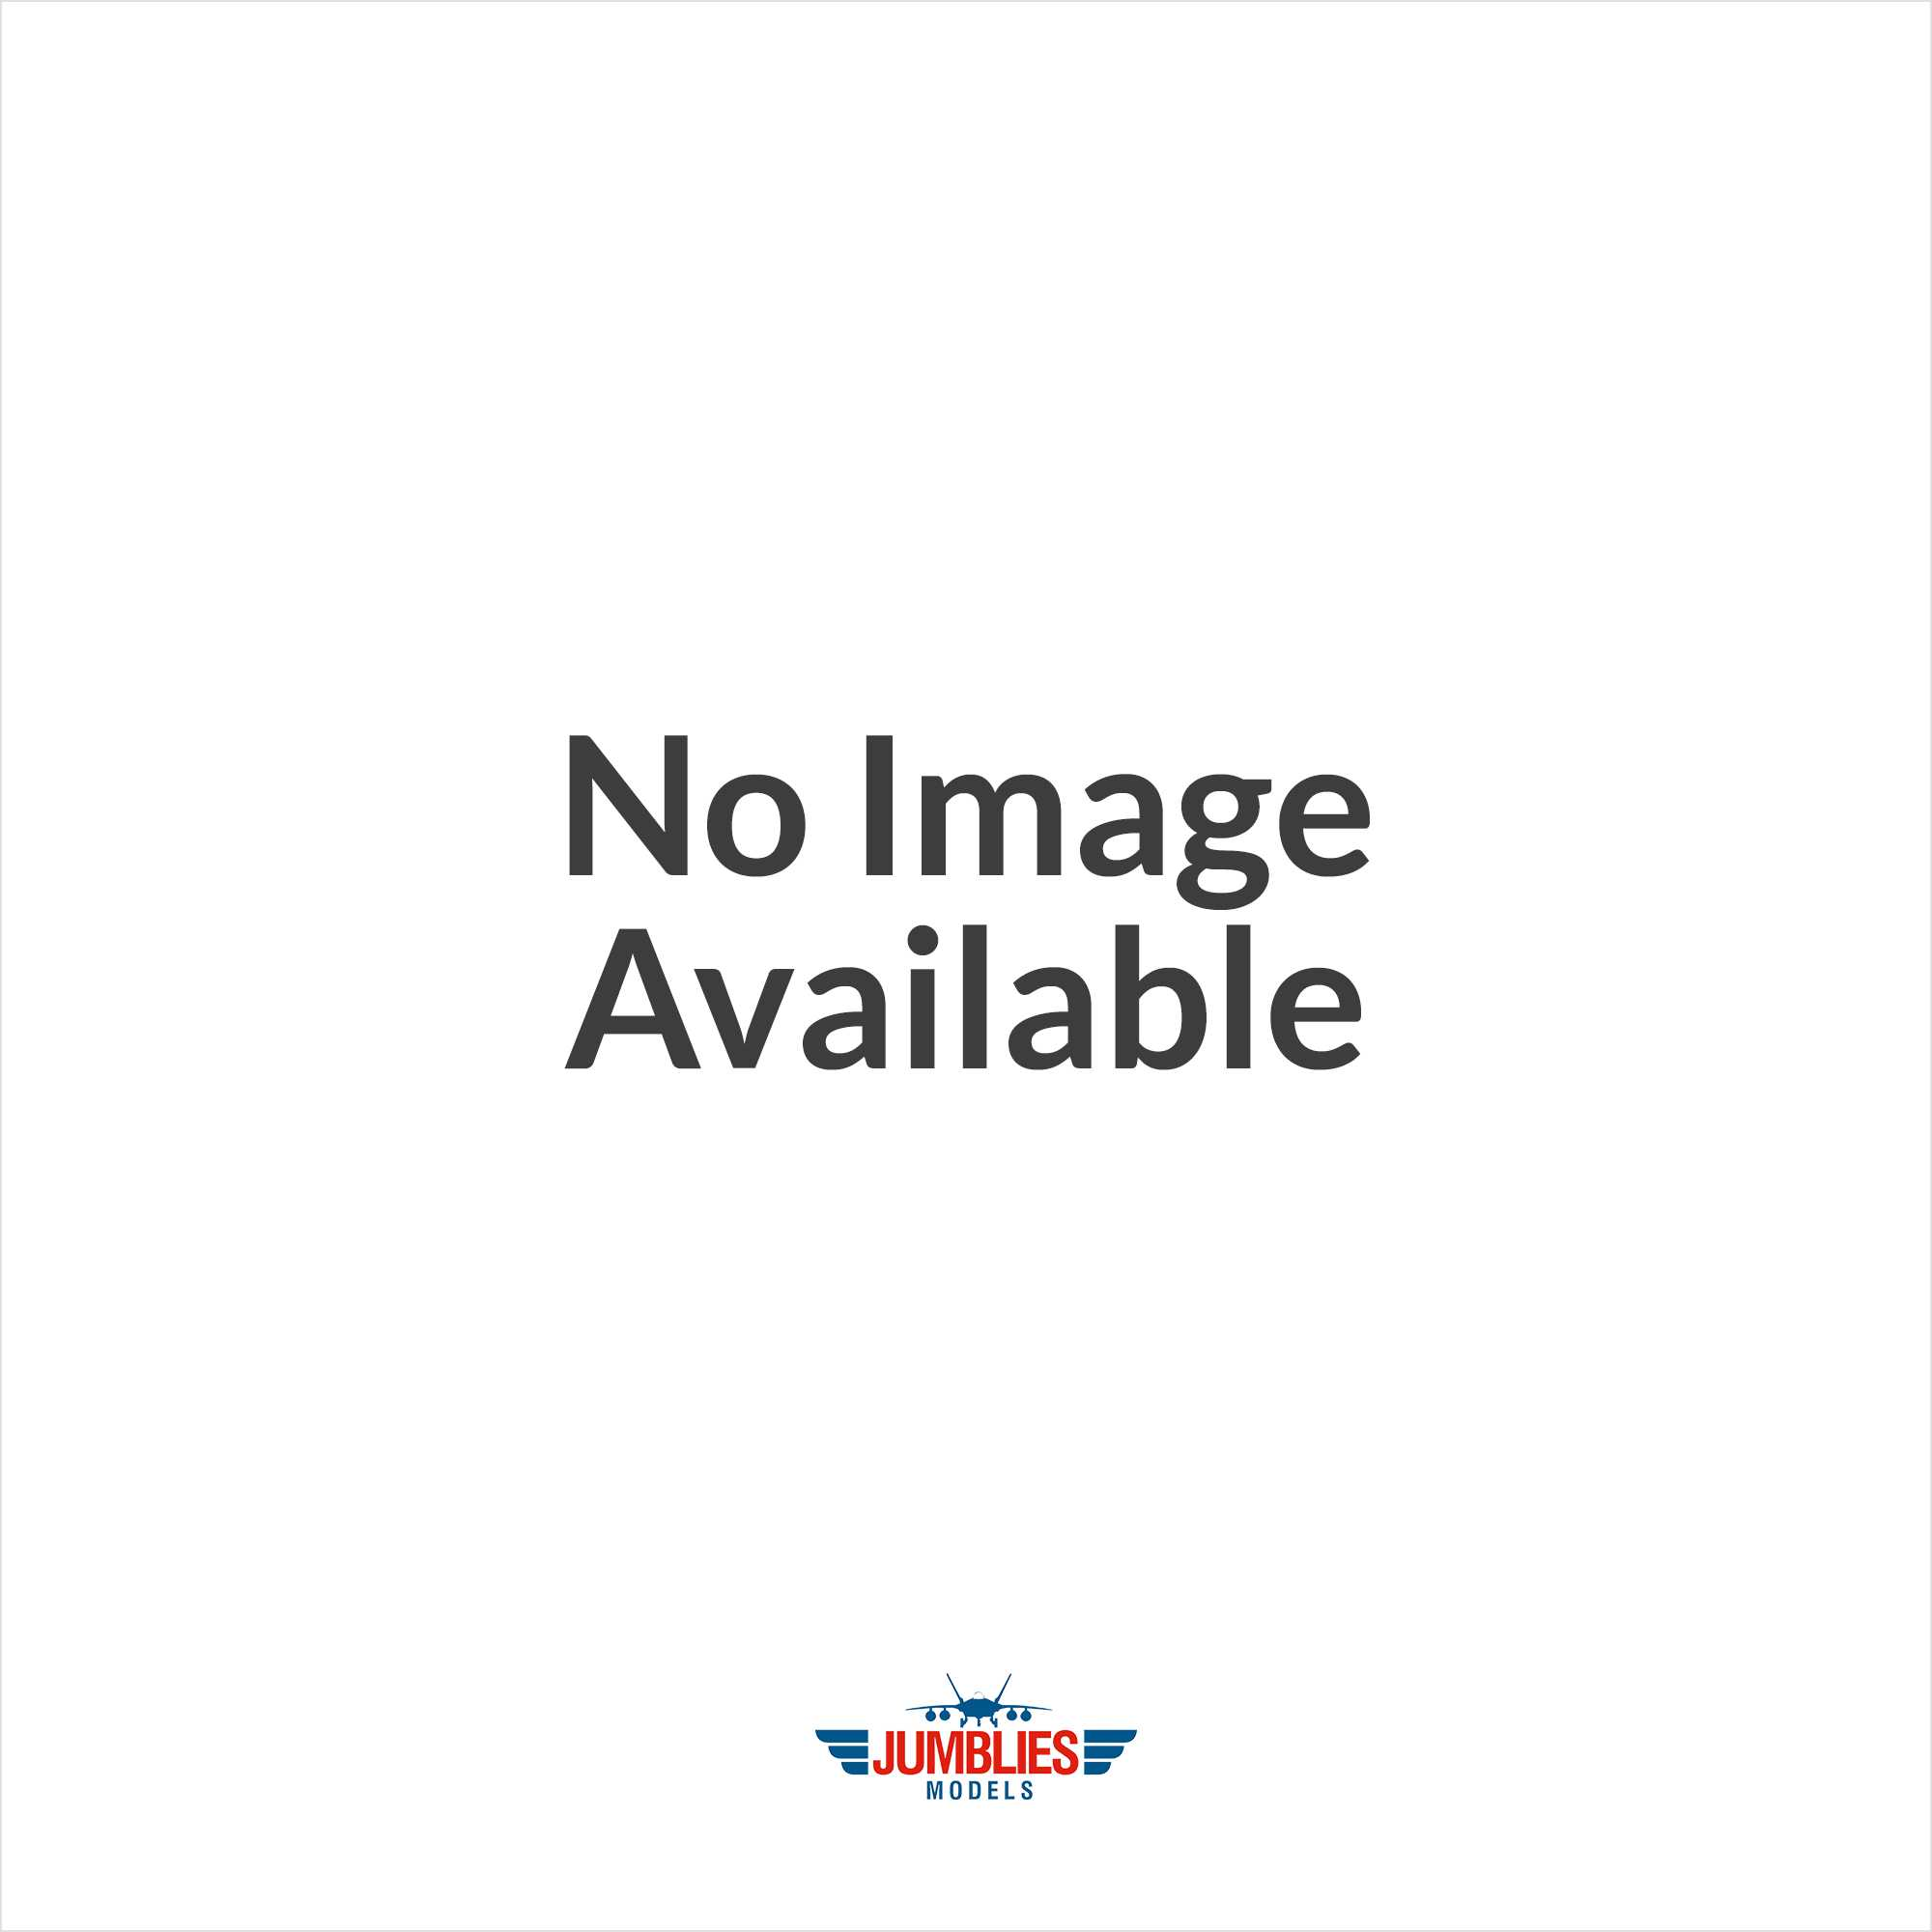 Moebius Models 1:87 The Munsters House 1313 Mockingbird Lane Model Kit